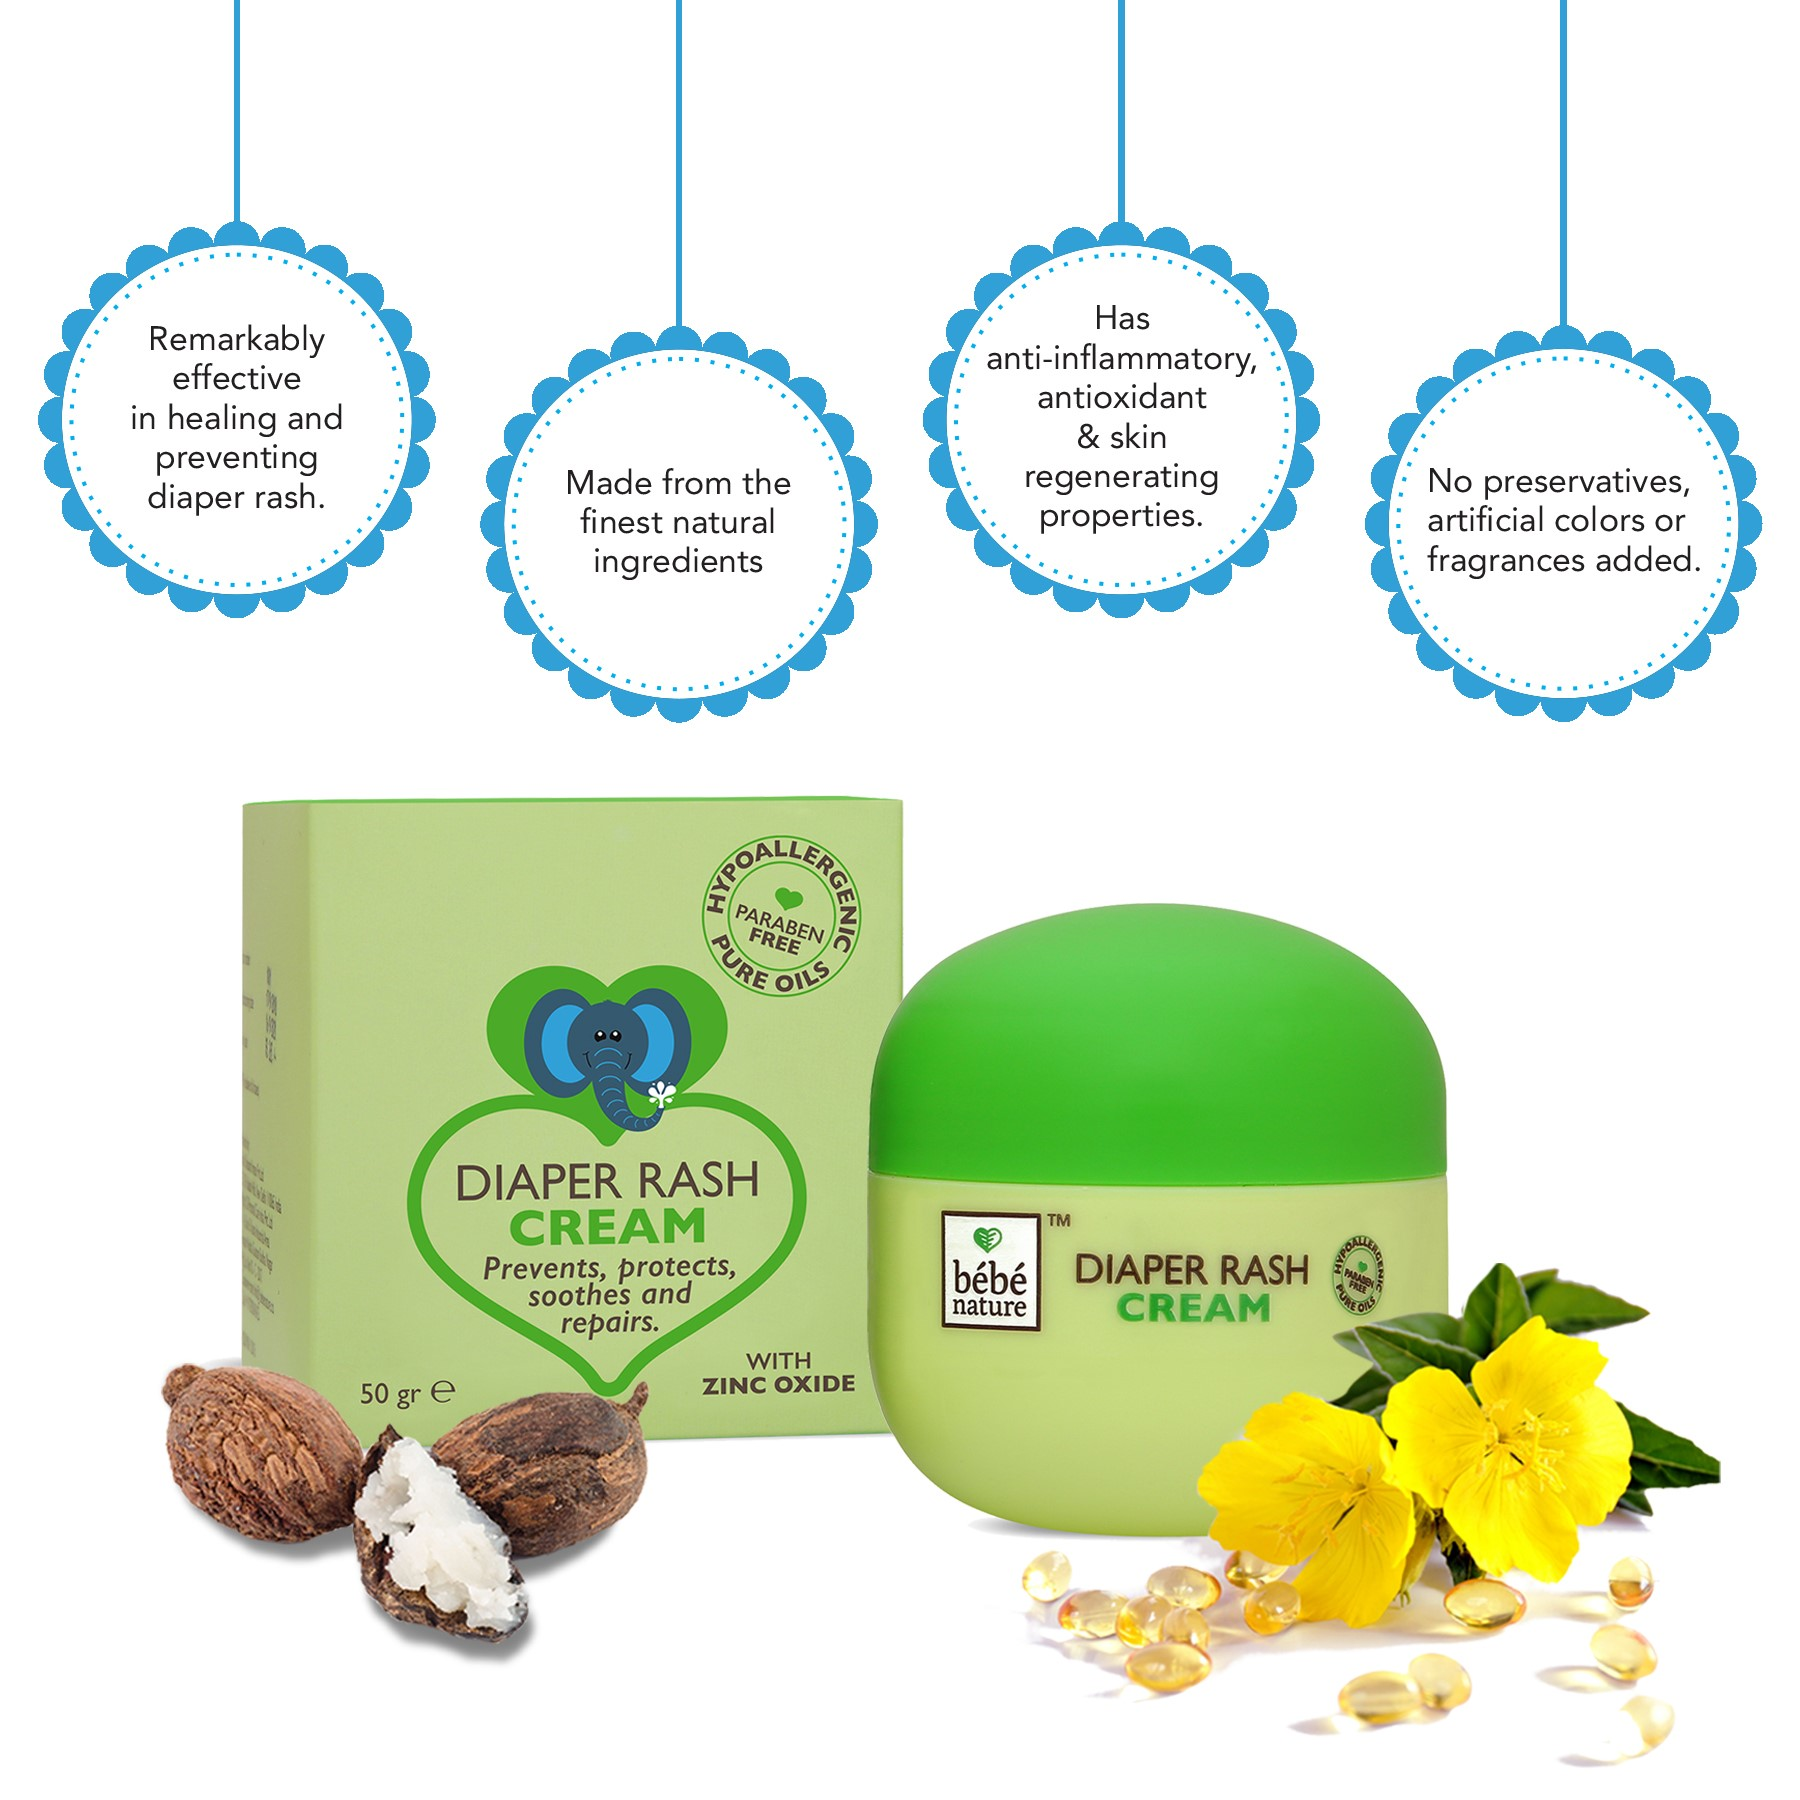 Bebe Nature + baby oils & creams + Bebe Nature Natural Diaper Rash Cream + 50 gm + shop